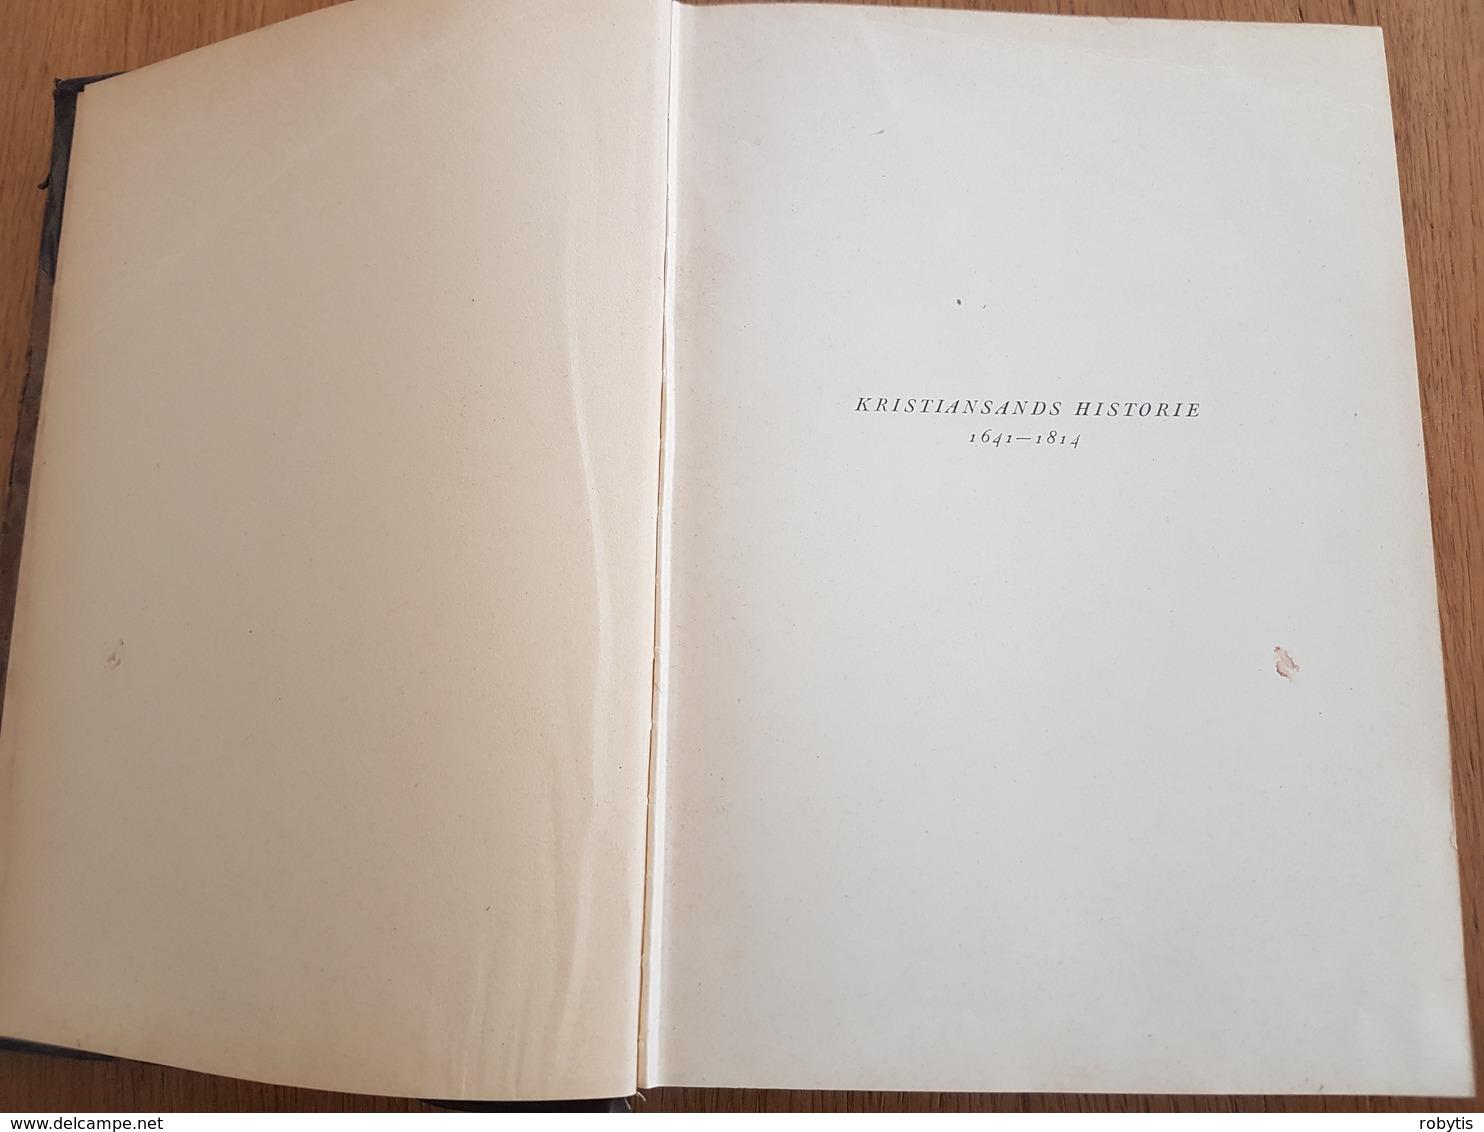 Norway Kristiansand History 1941 - Books, Magazines, Comics